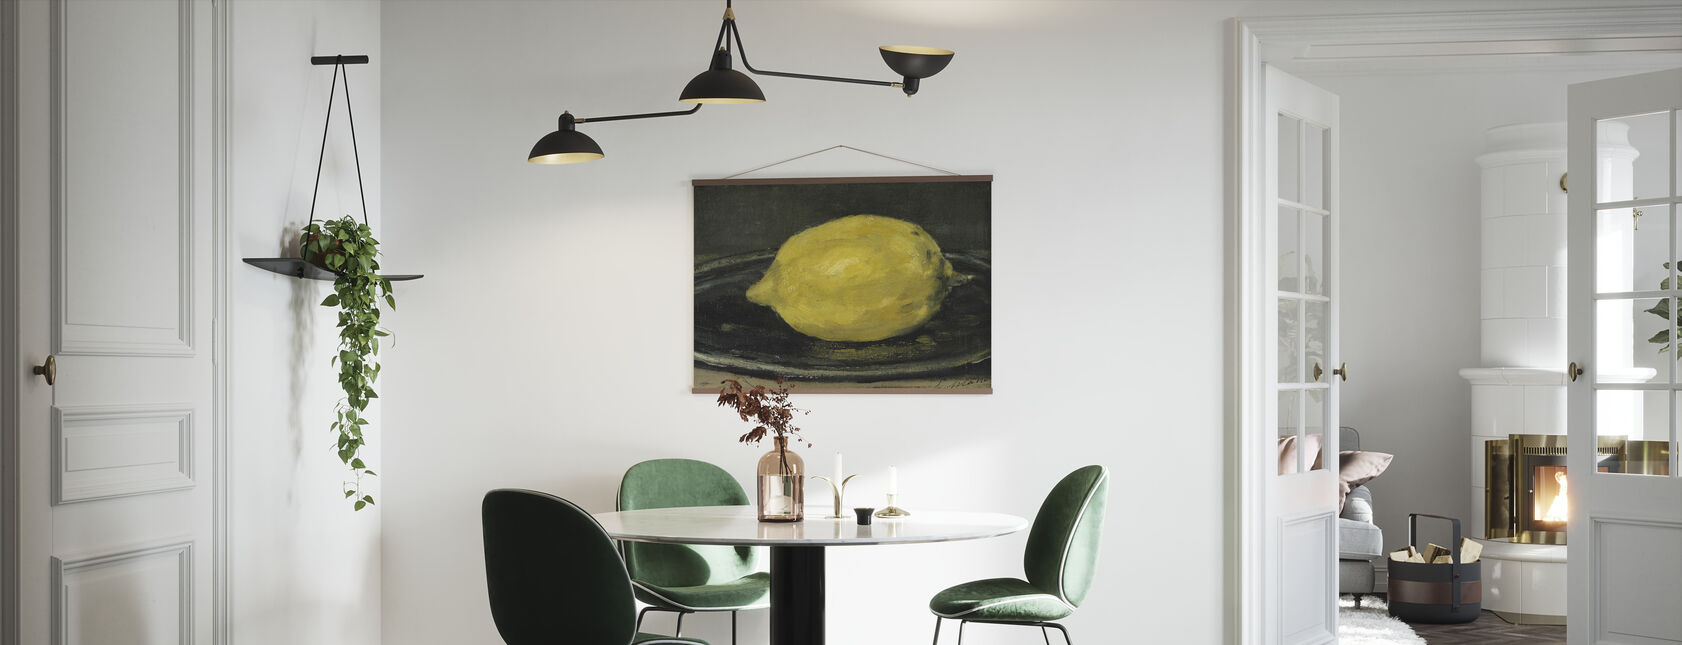 Lemon, Edouard Manet - Poster - Kitchen